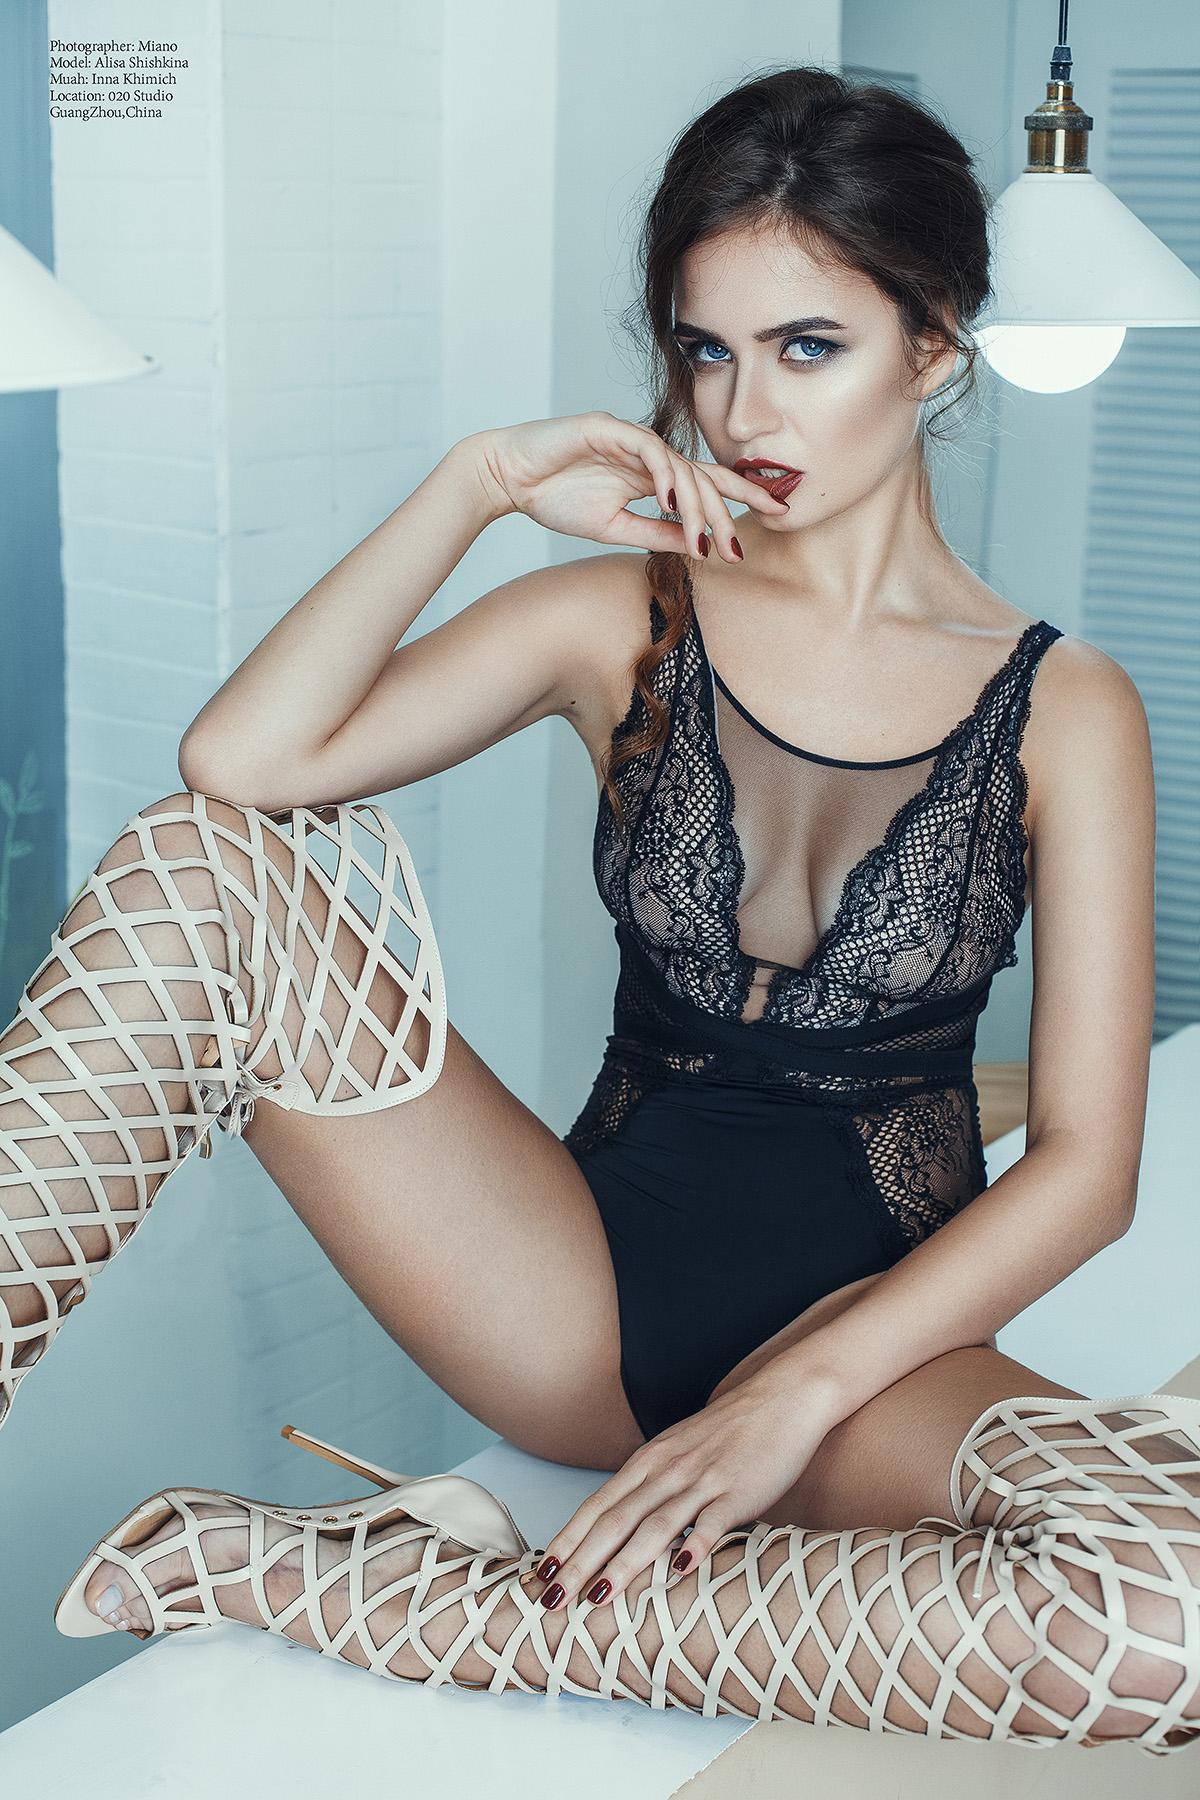 Tits Alisa Shishkina naked photo 2017